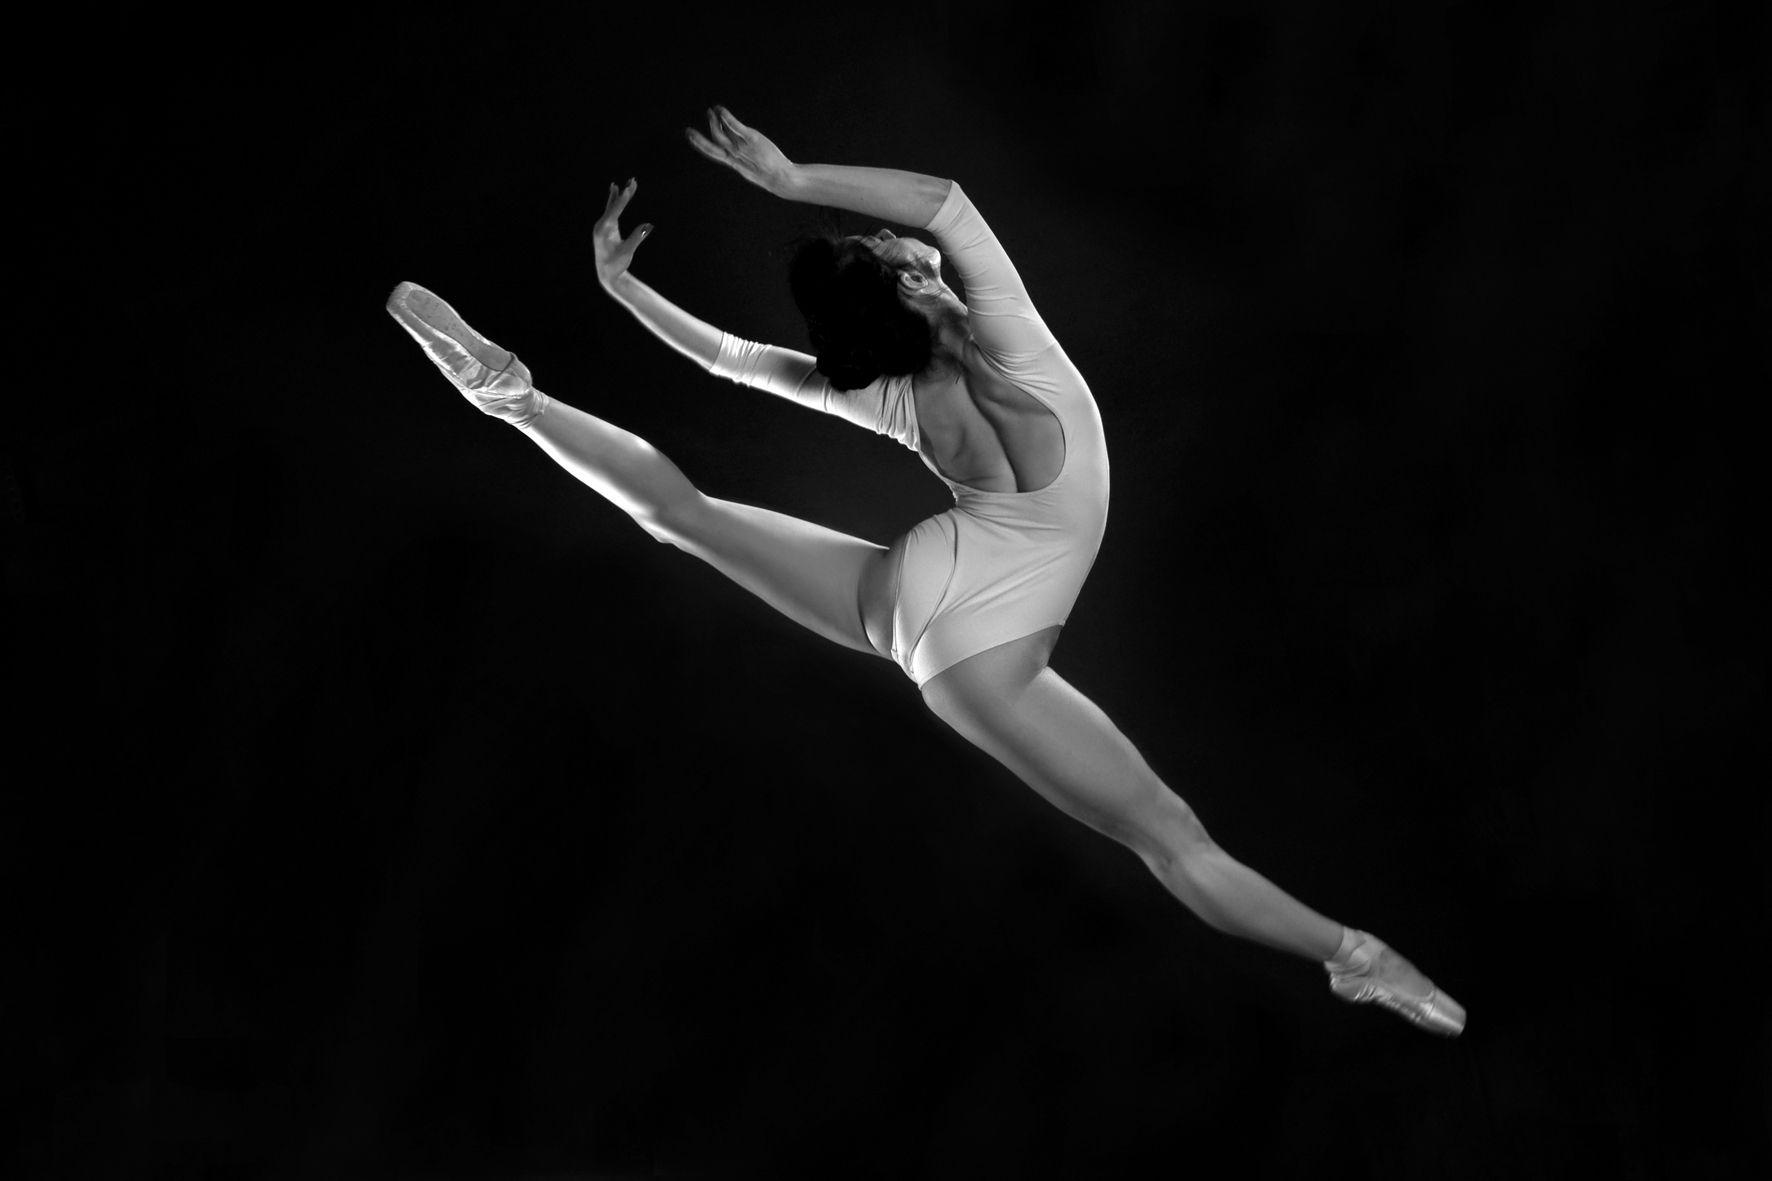 the ballerina wallpaper - photo #11